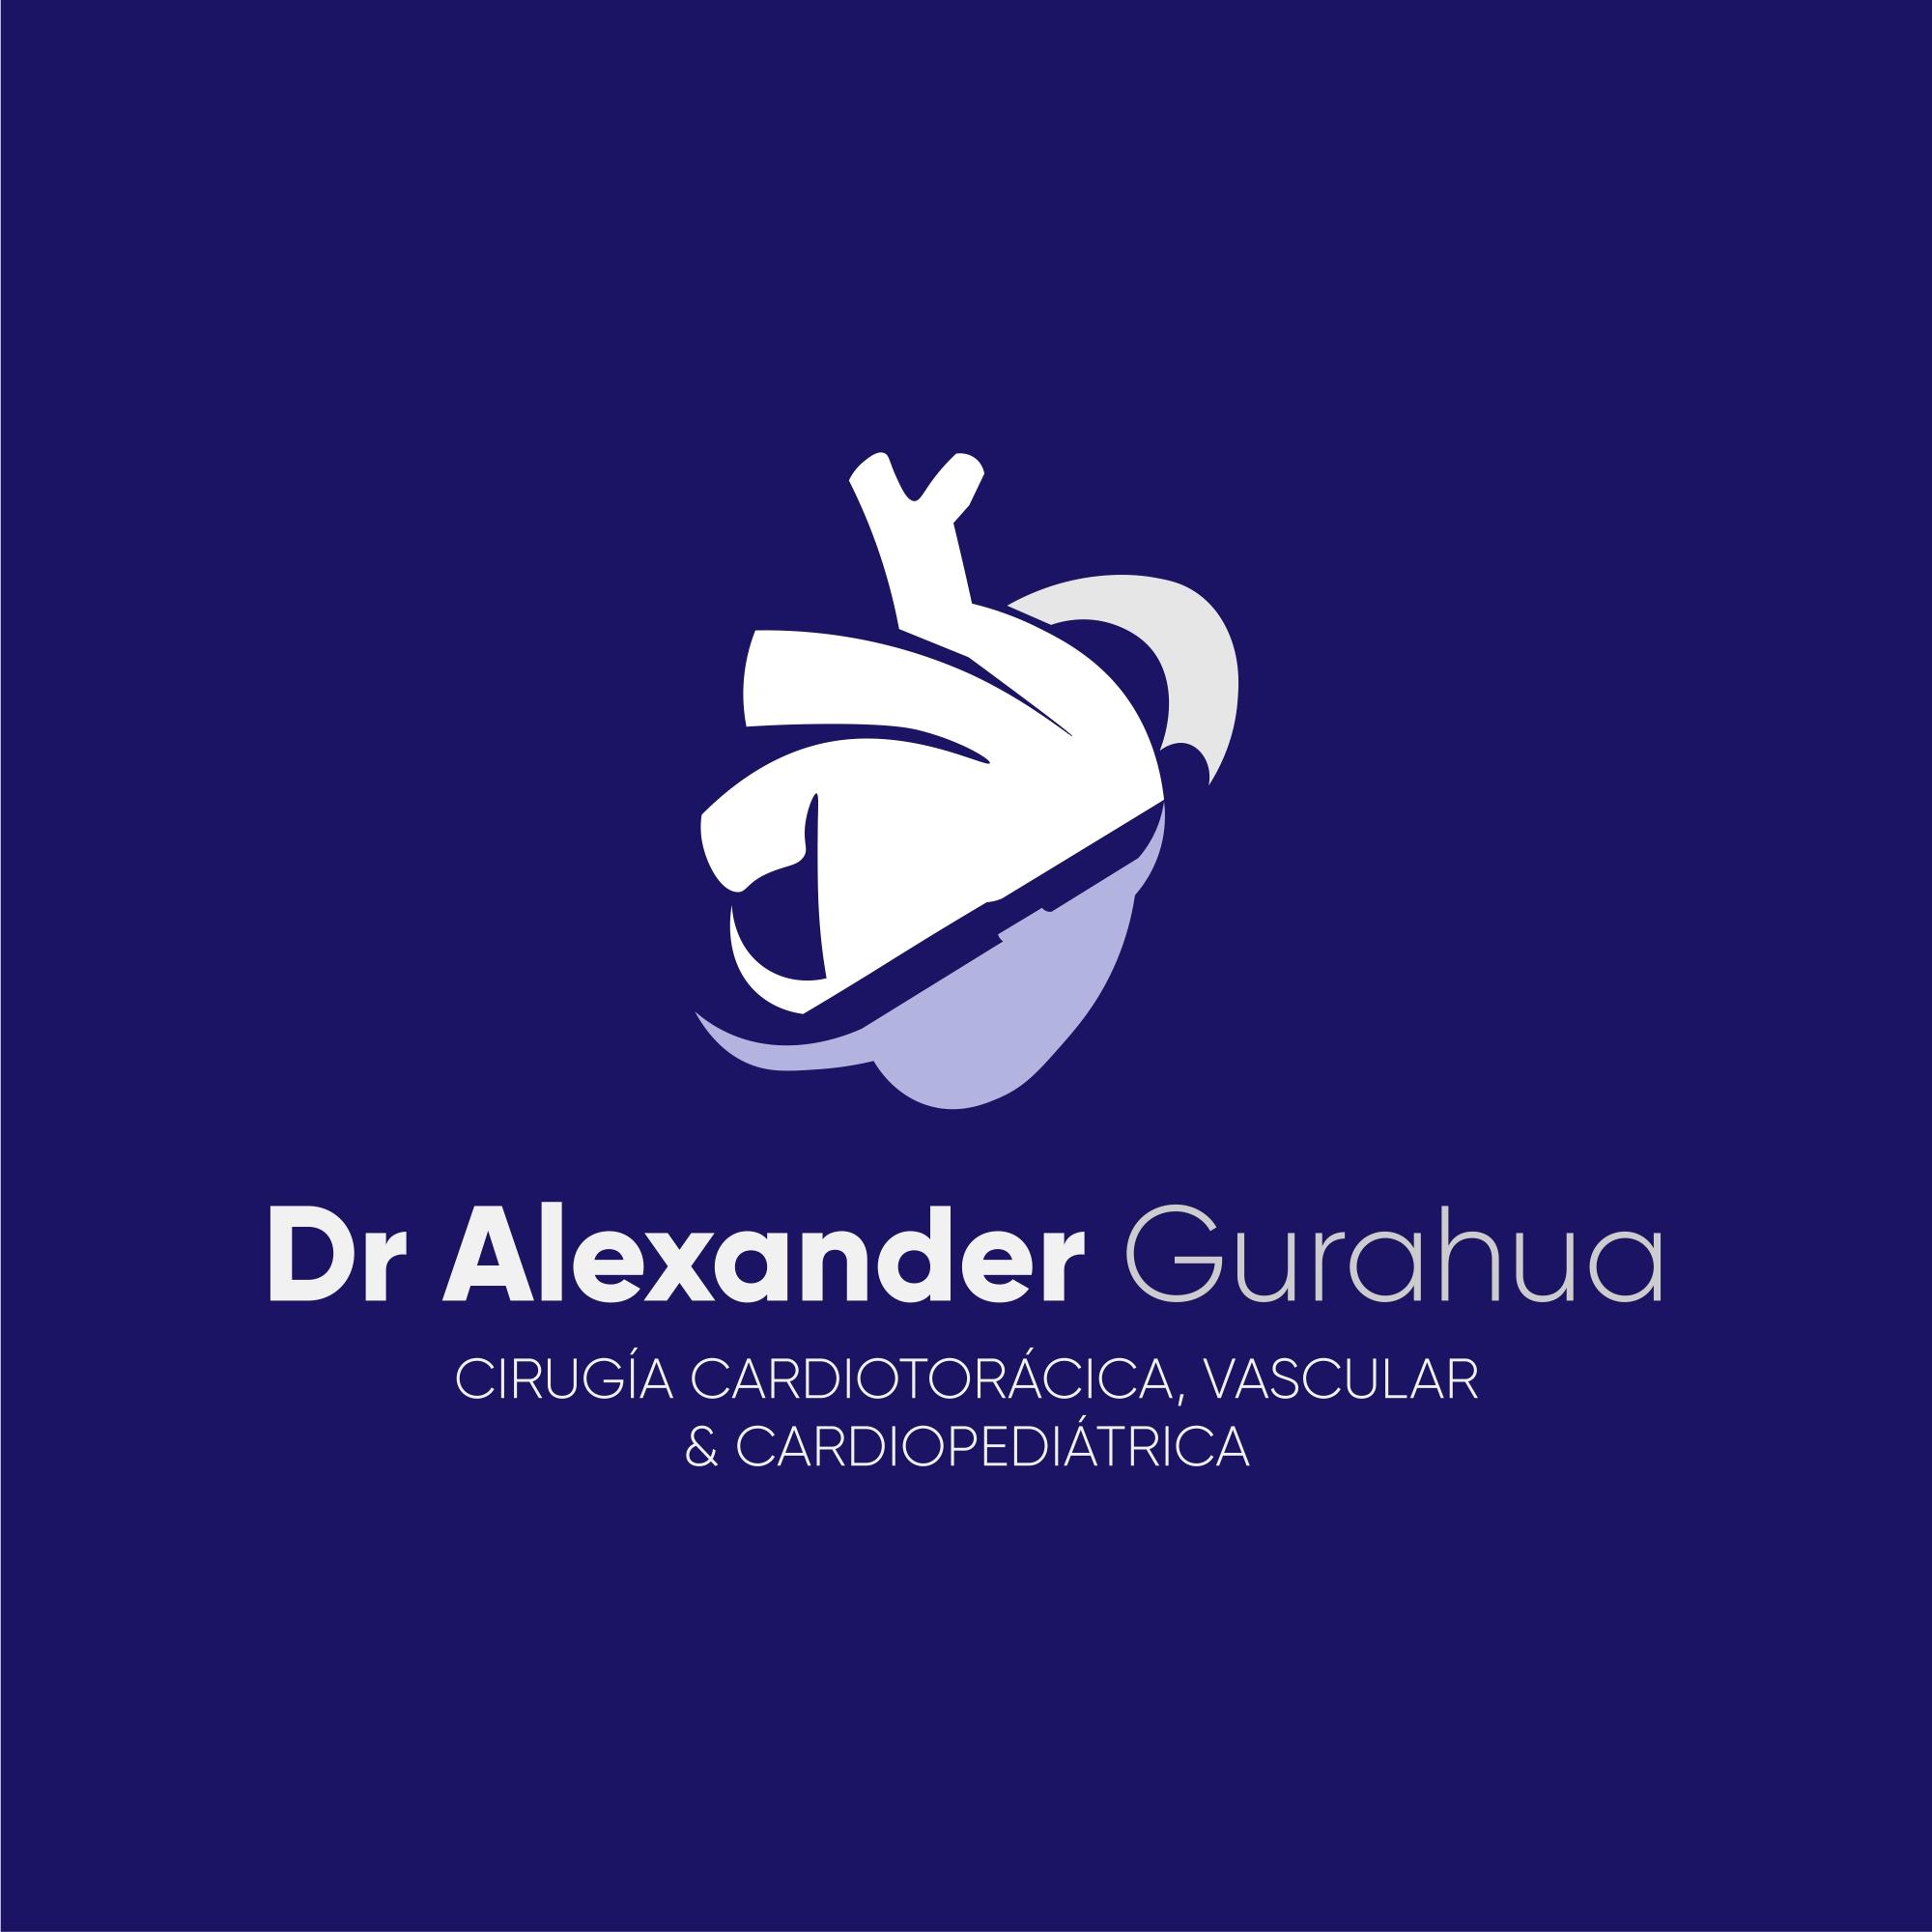 Dr. Alexander Gurahua